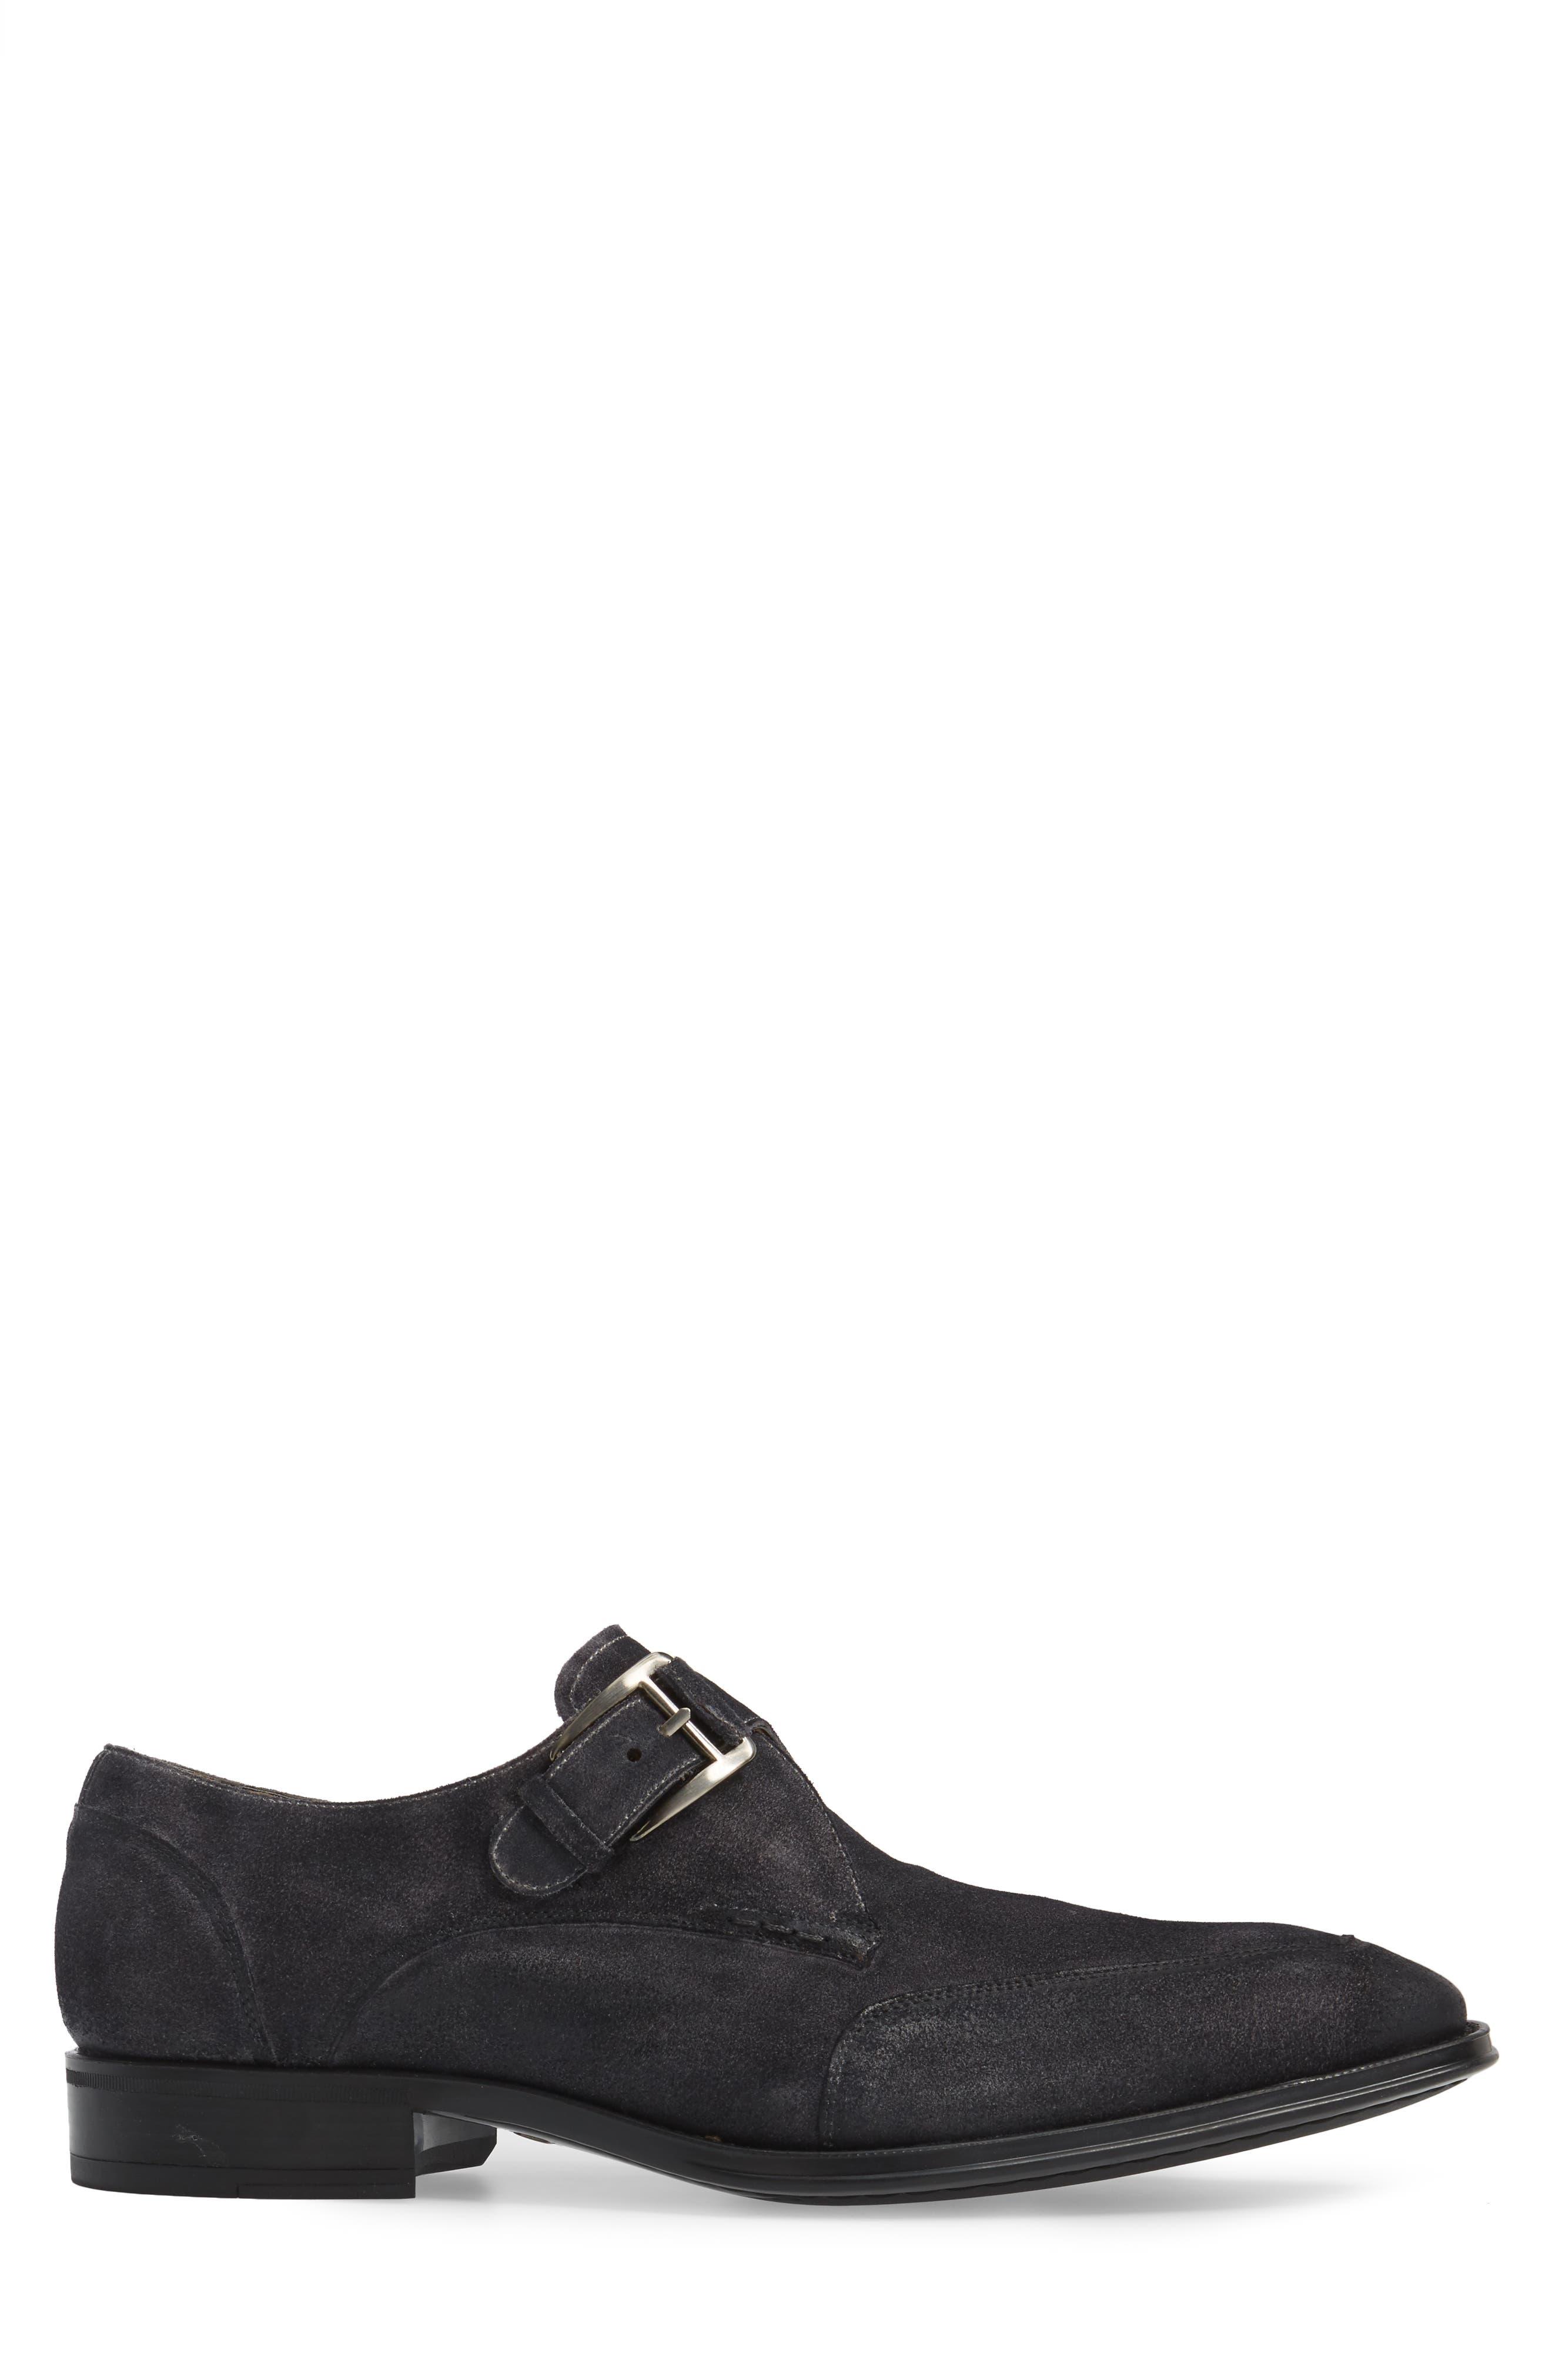 Alternate Image 3  - Mezlan Baza Monk Strap Shoe (Men)